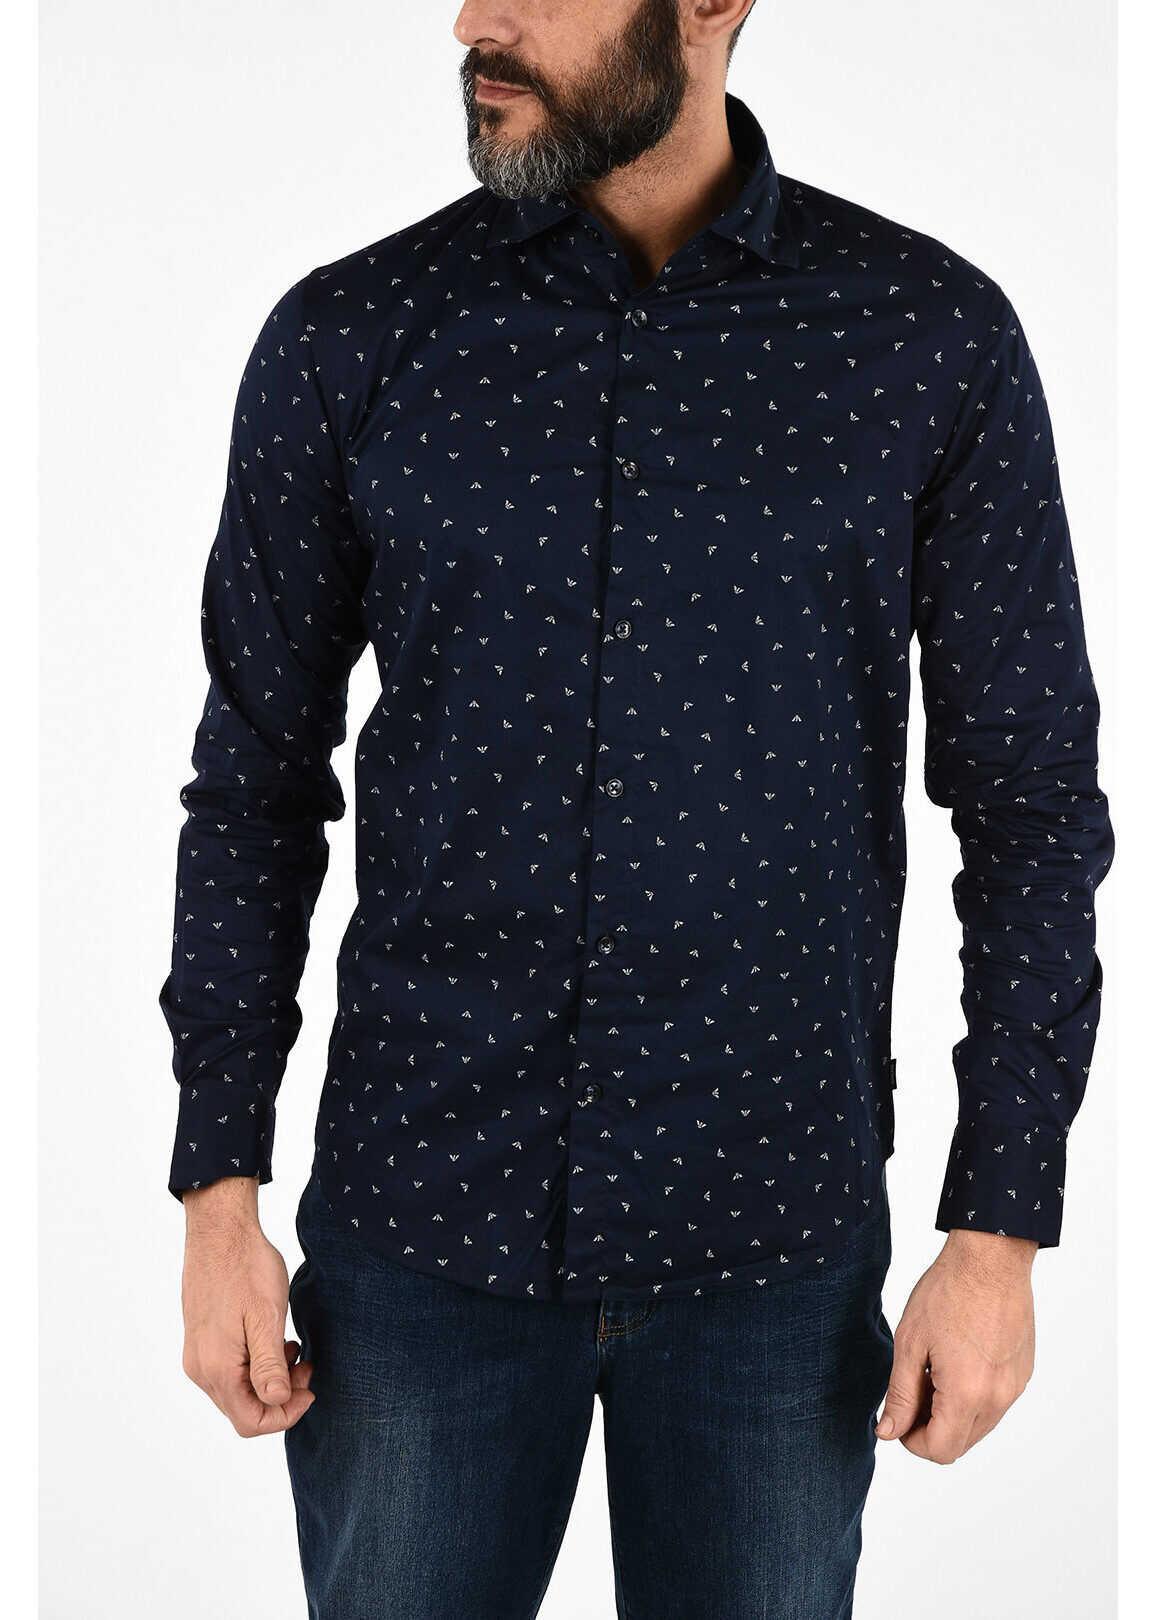 Armani ARMANI JEANS All Over Logo Slim Fit Shirt BLUE imagine